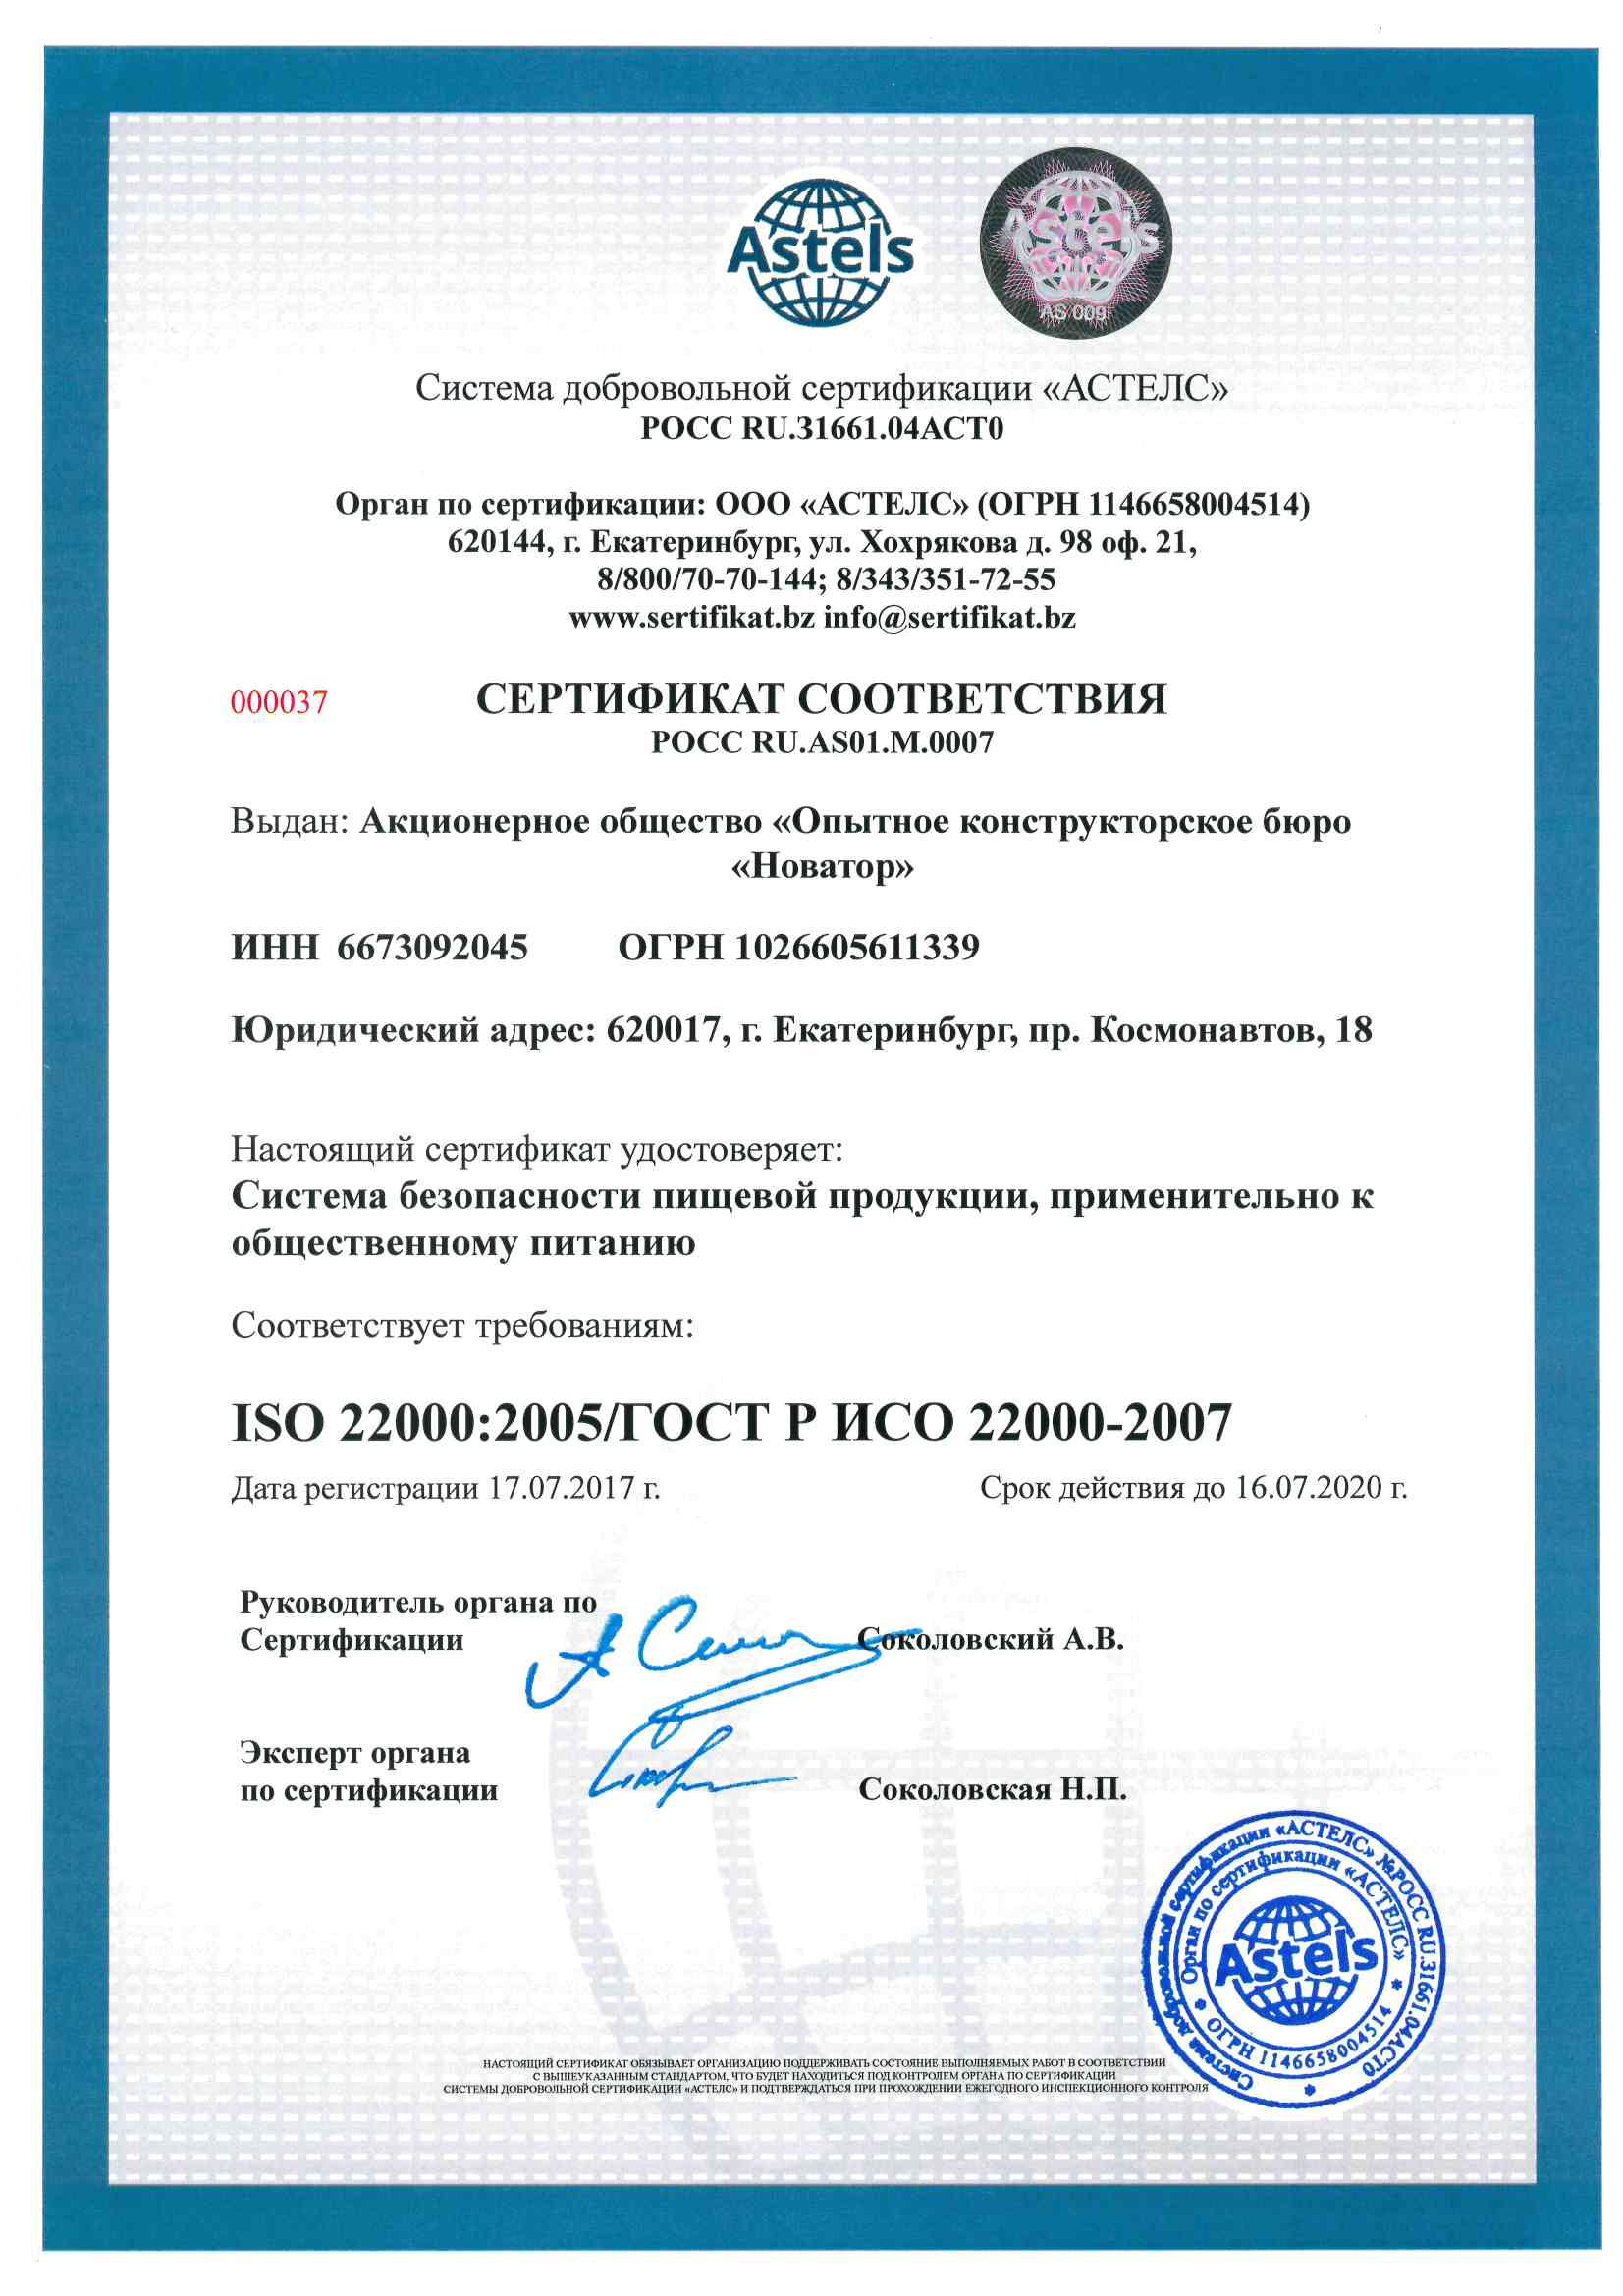 Сертификат ИСО 22000-2007 Астелс